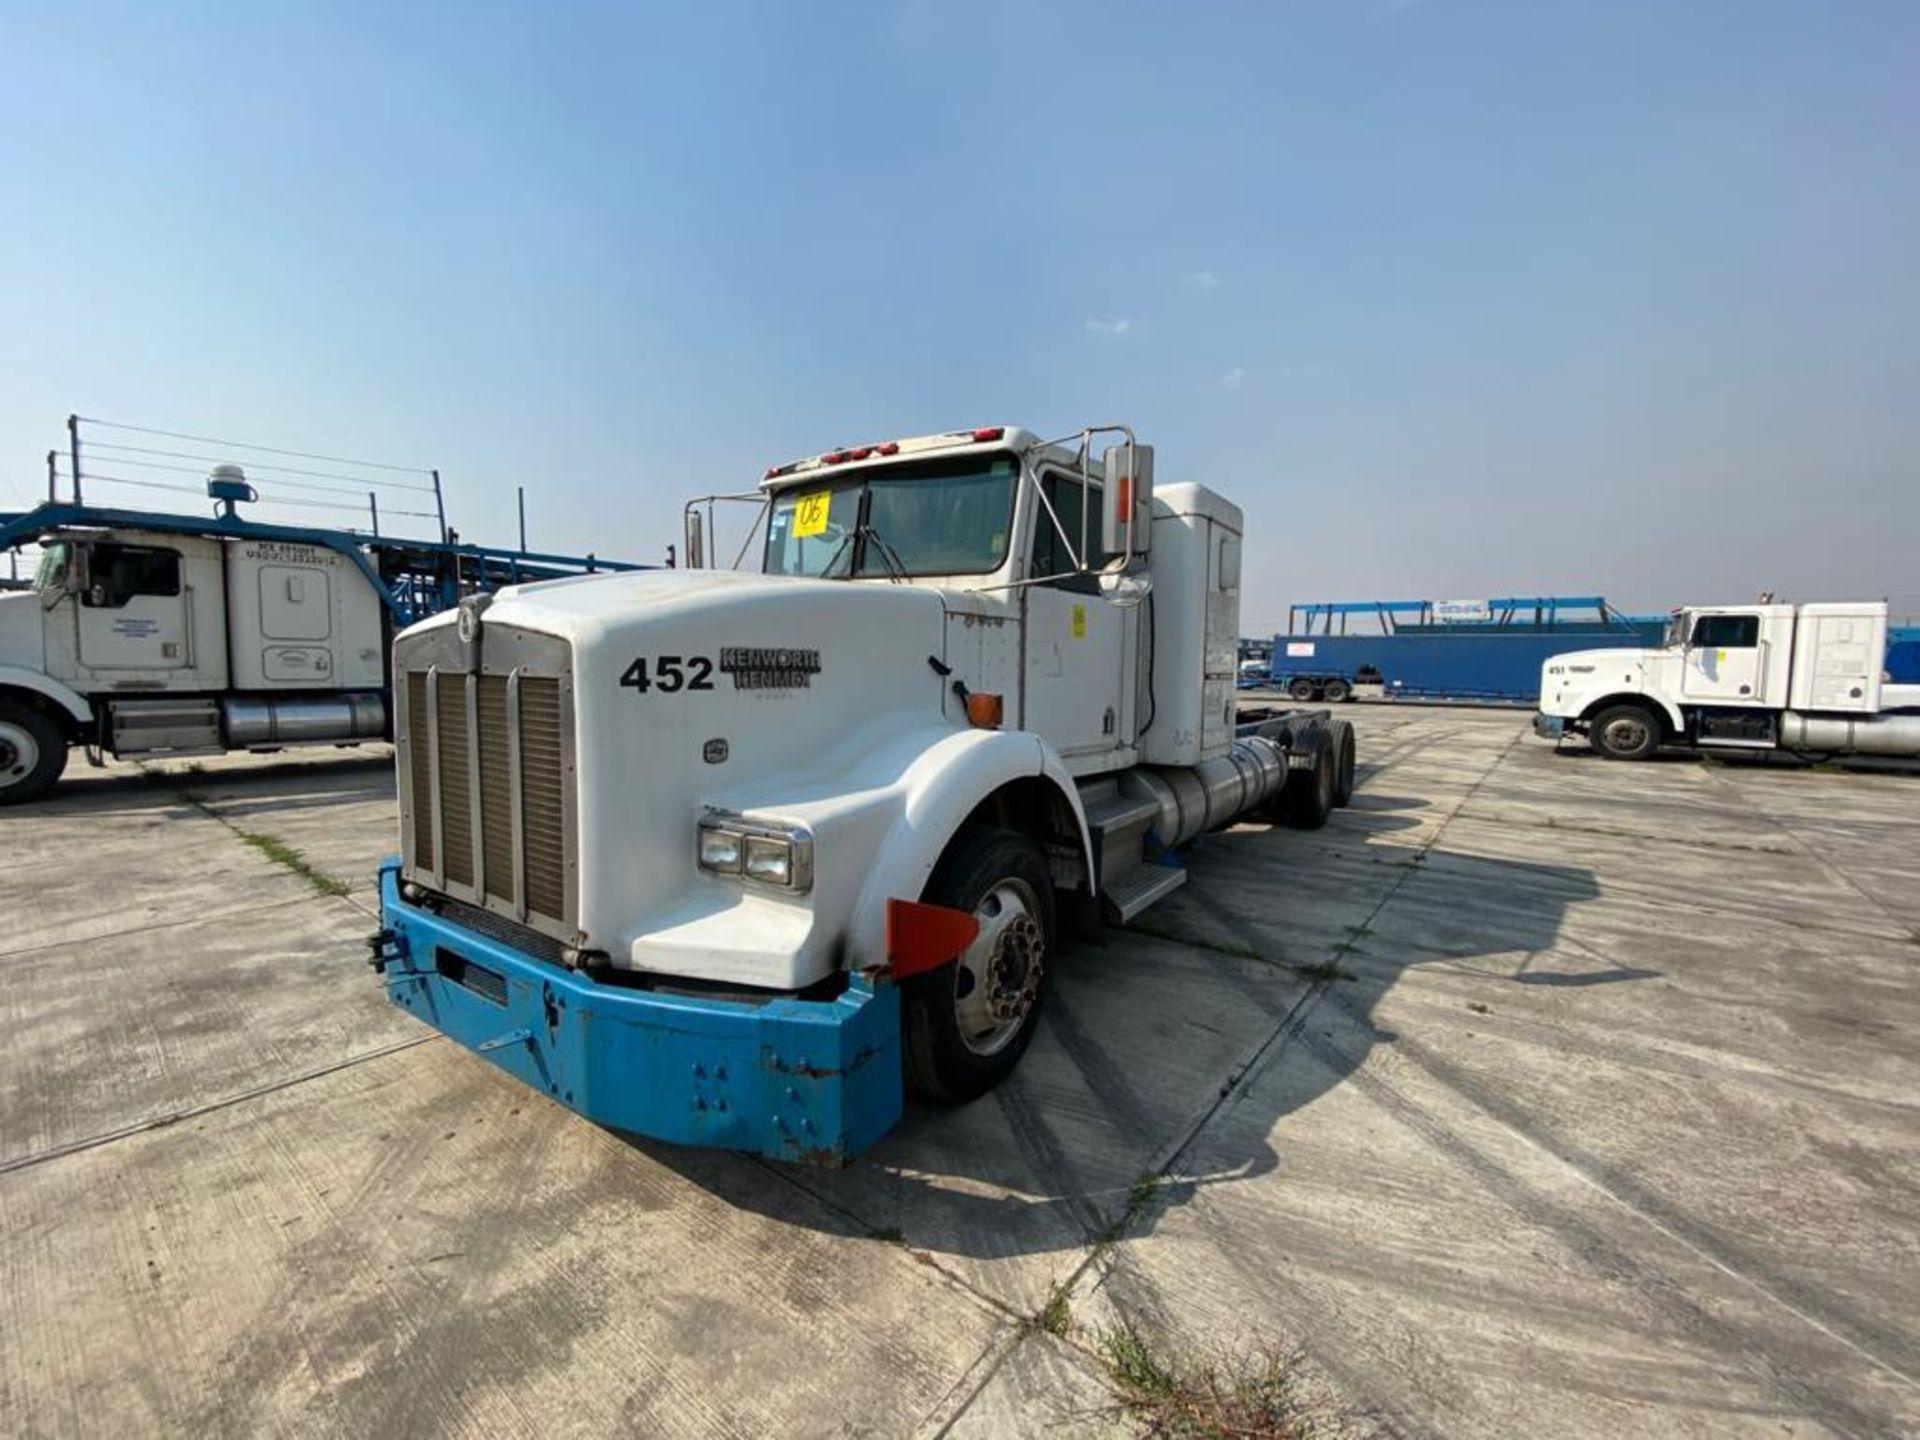 1998 Kenworth Sleeper truck tractor, standard transmission of 18 speeds - Image 7 of 75